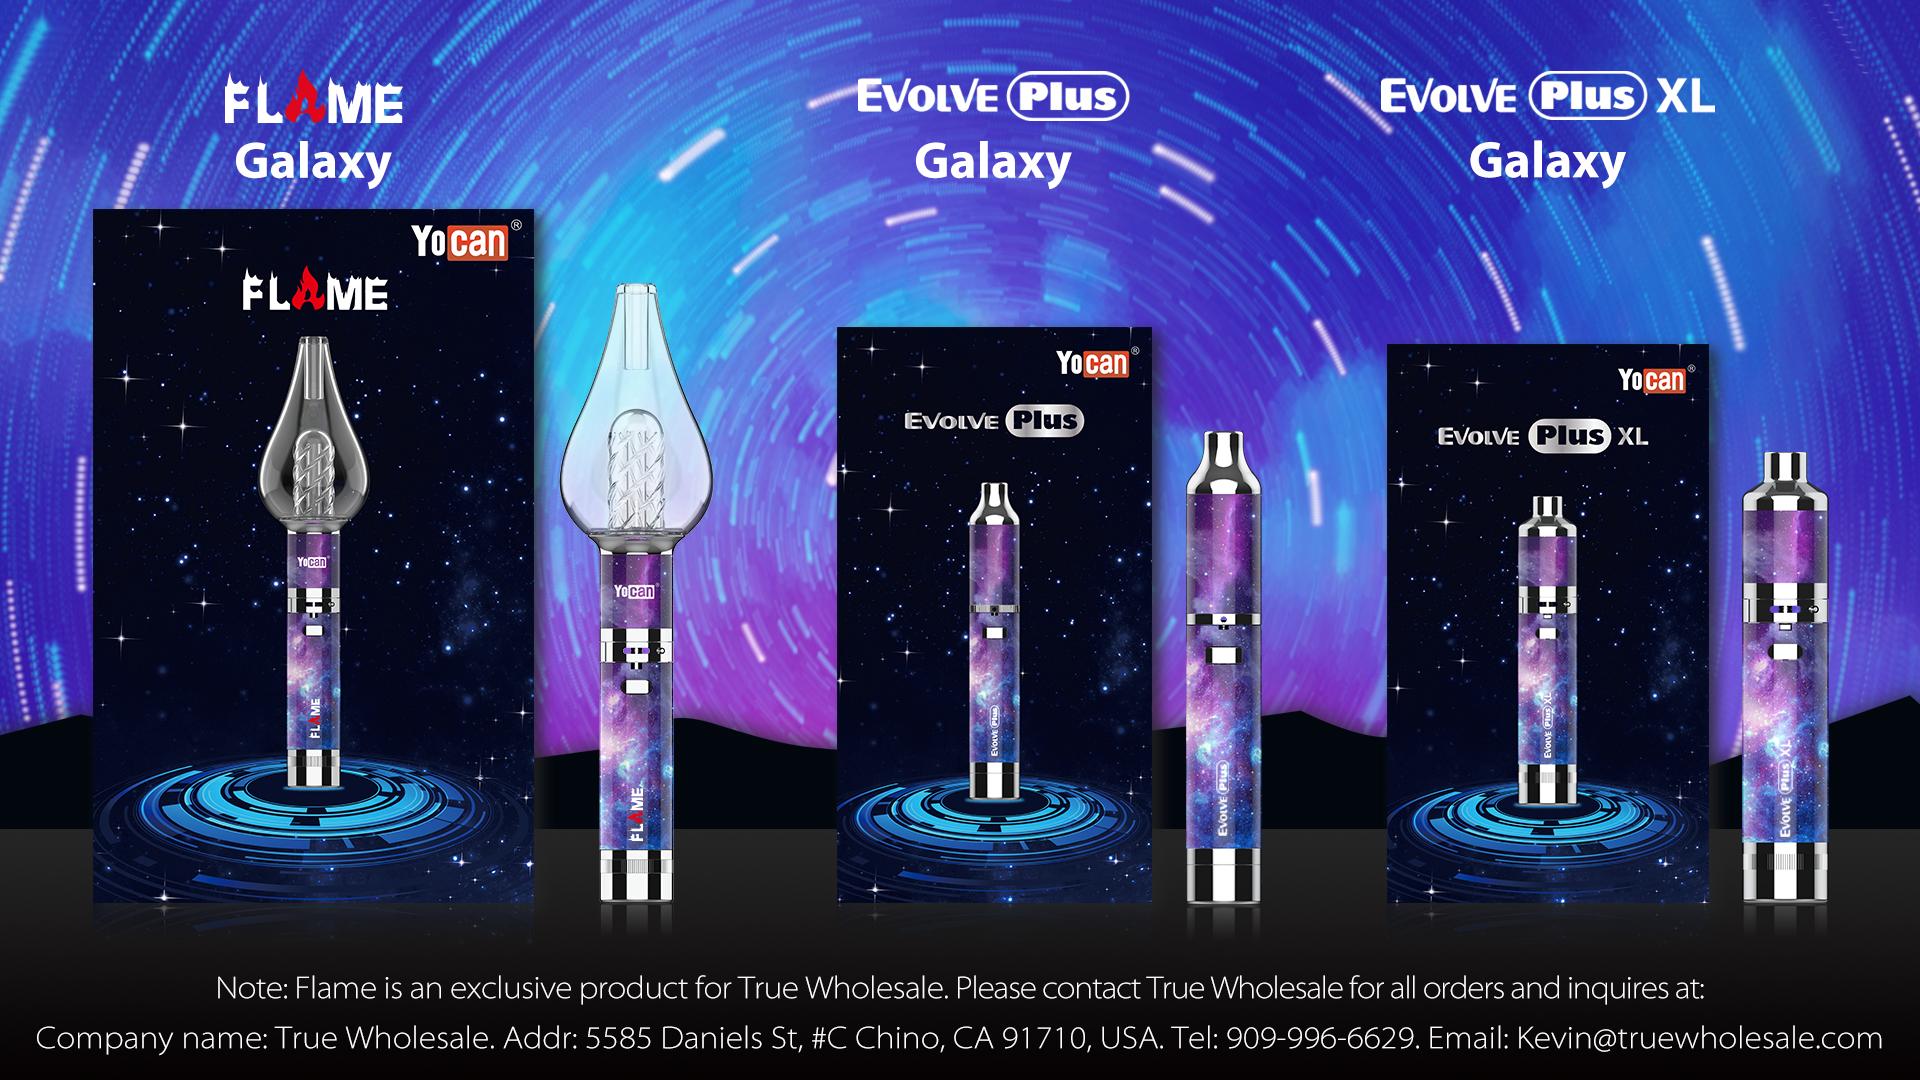 Yocan Galaxy Edition